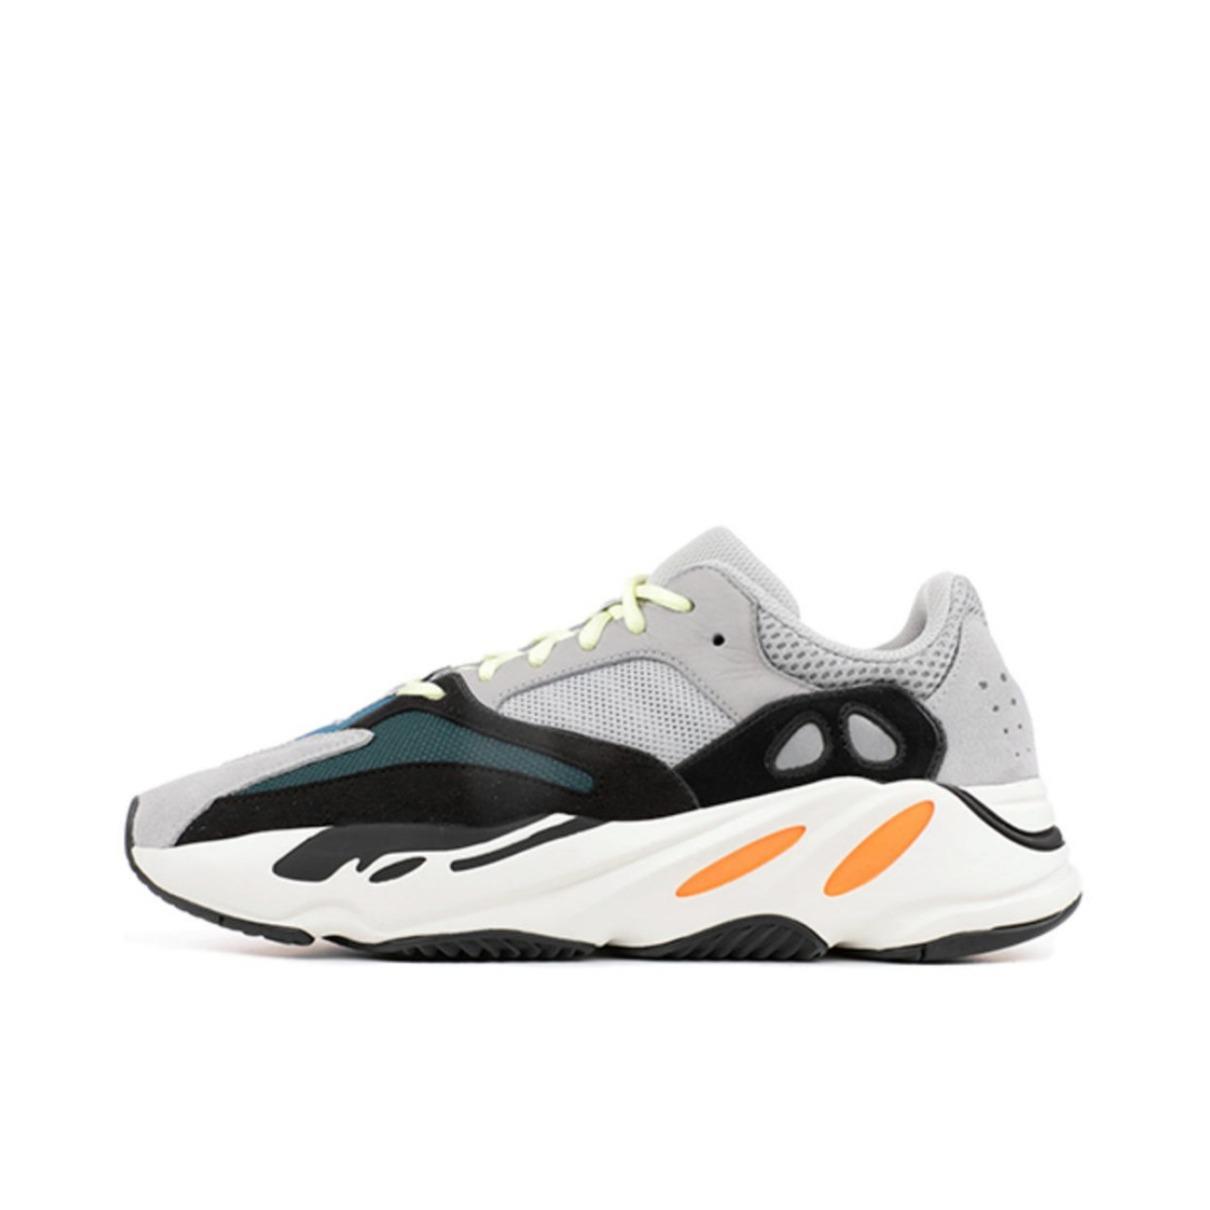 adidas 阿迪达斯 adidas Yeezy Boost Runner 700 运动板鞋